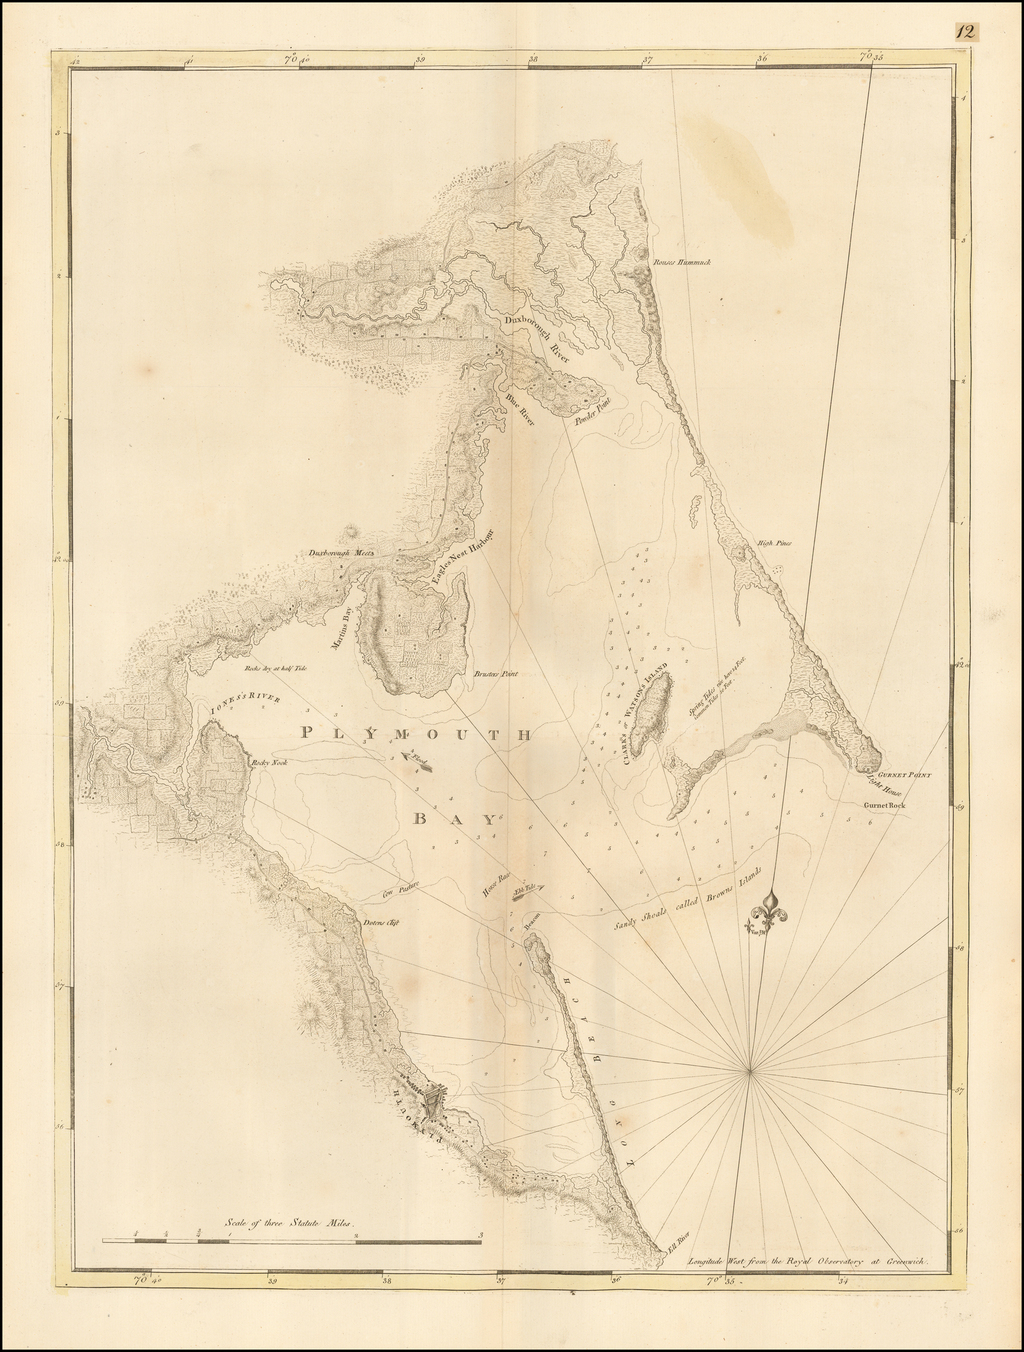 [Plymouth Bay, Cape Cod Bay, Duxbury Bay] By Joseph Frederick Wallet Des Barres